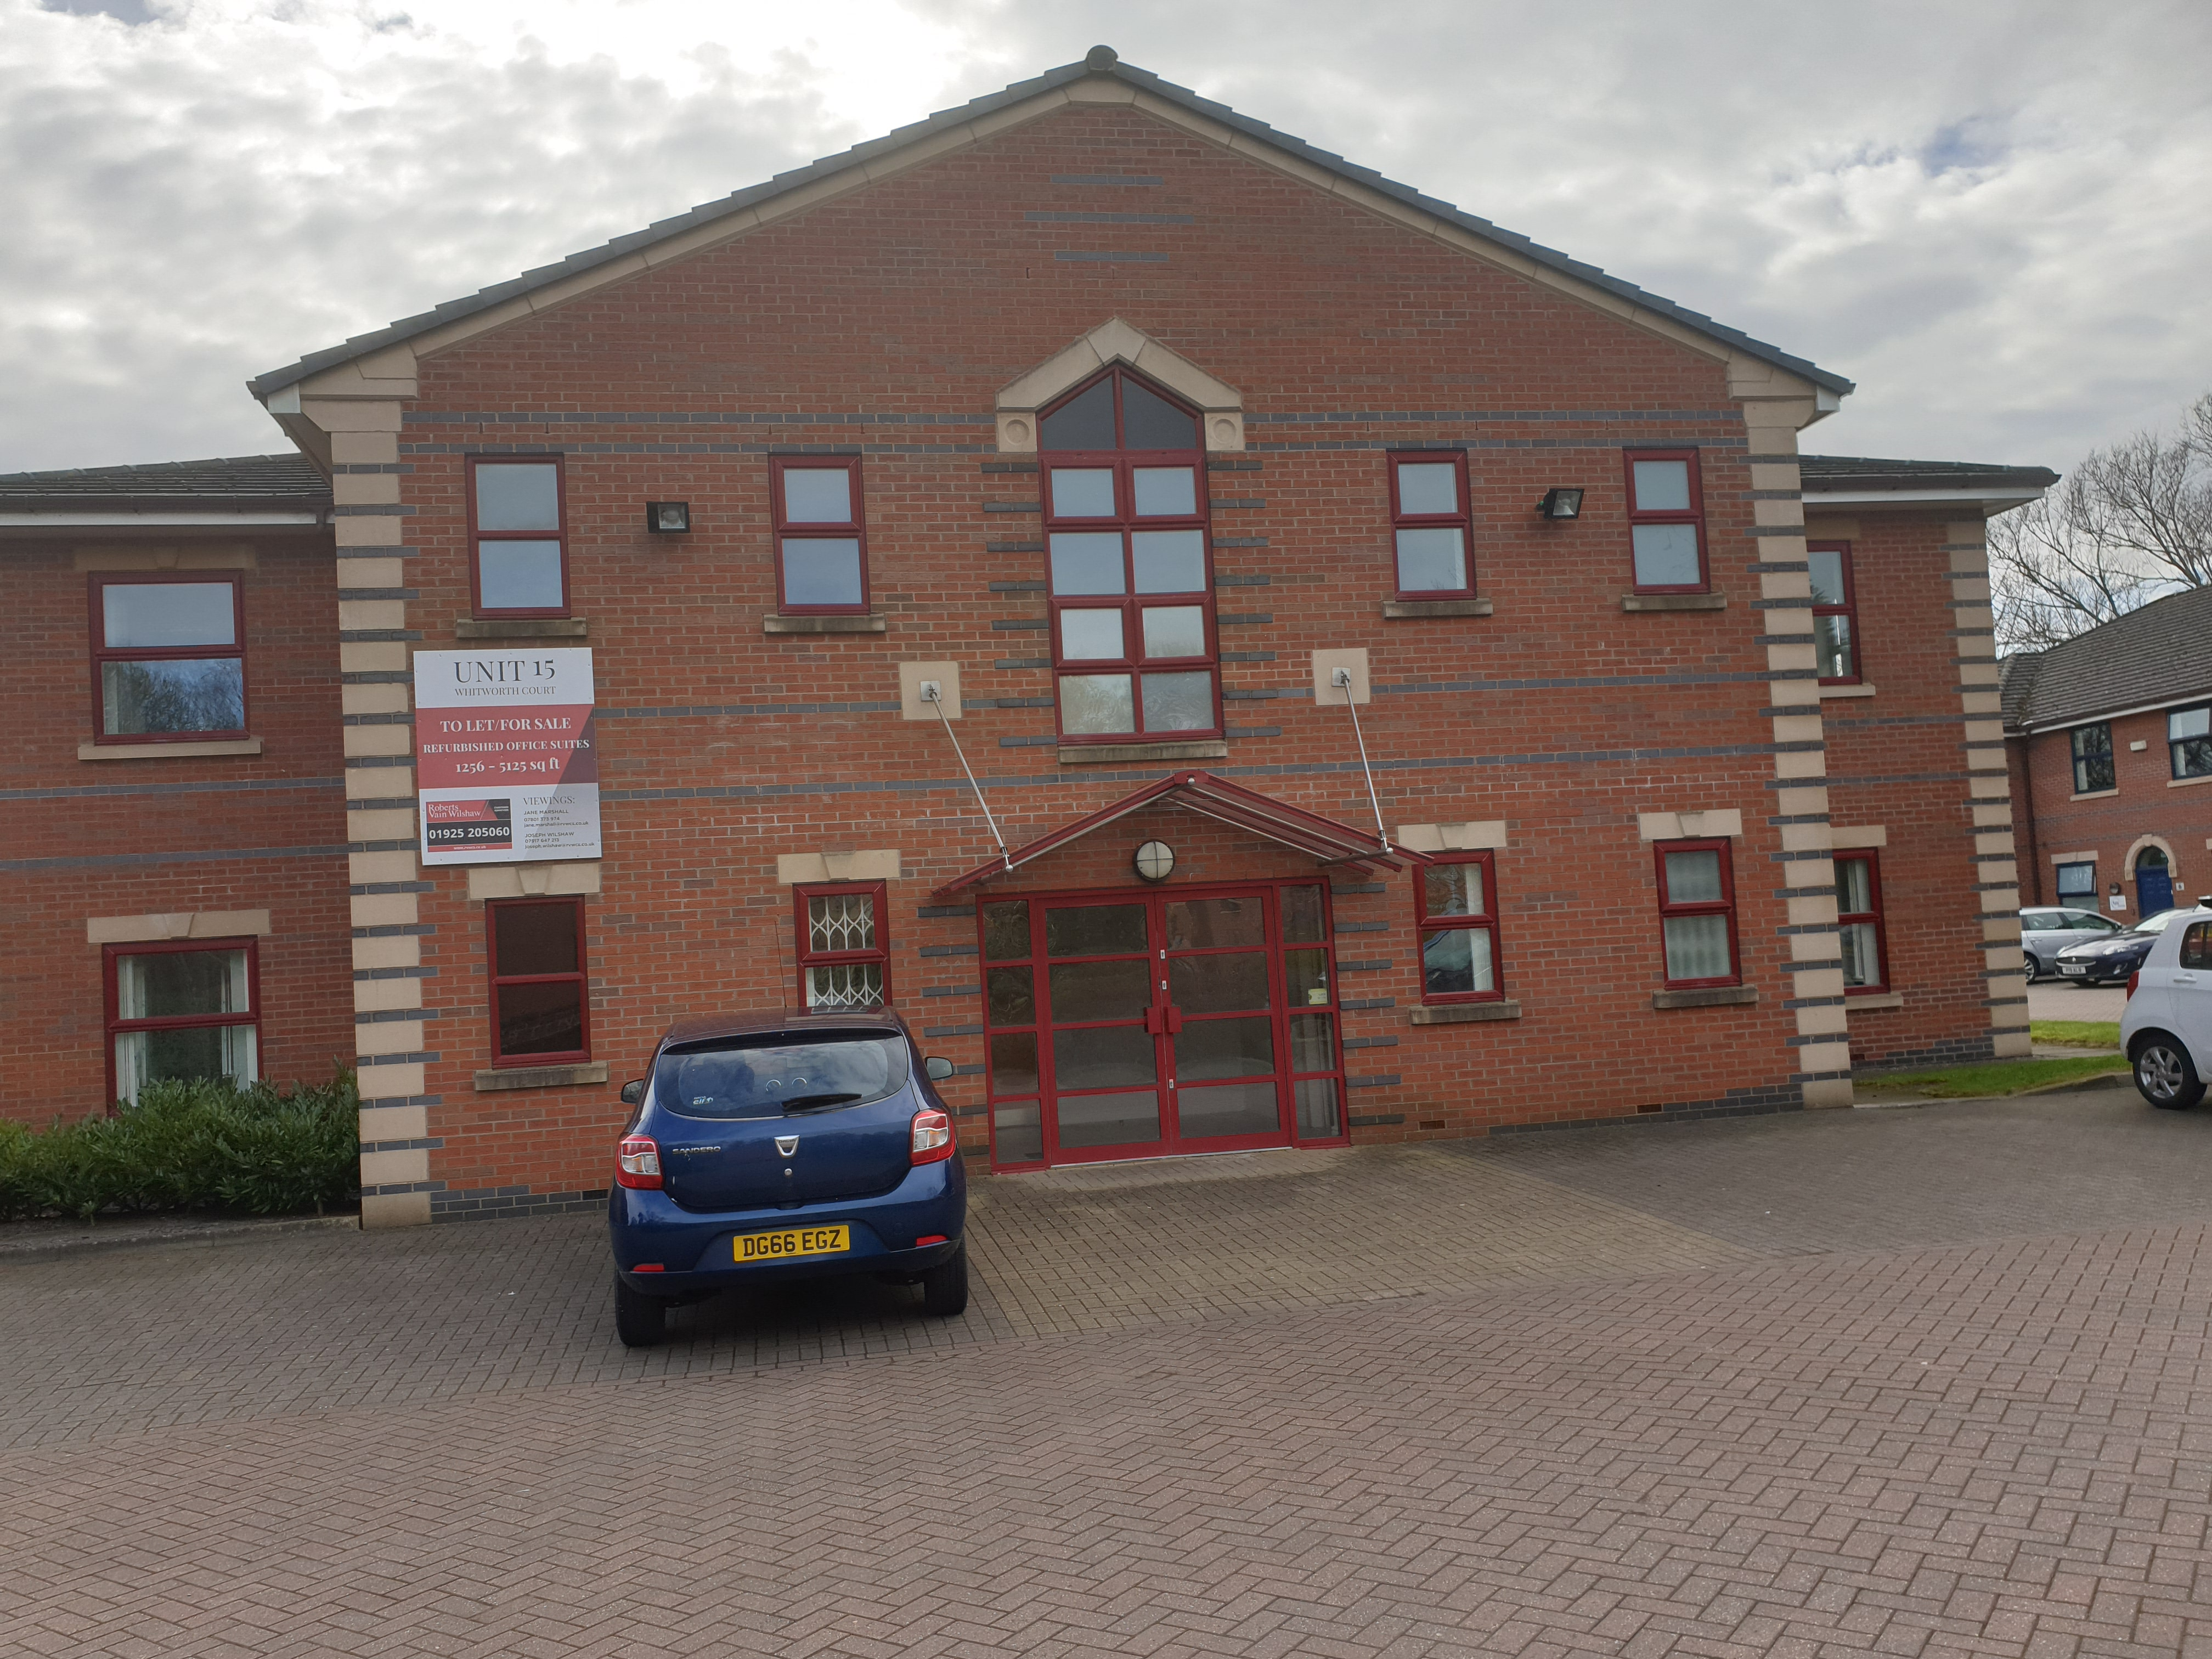 Whitworth Court